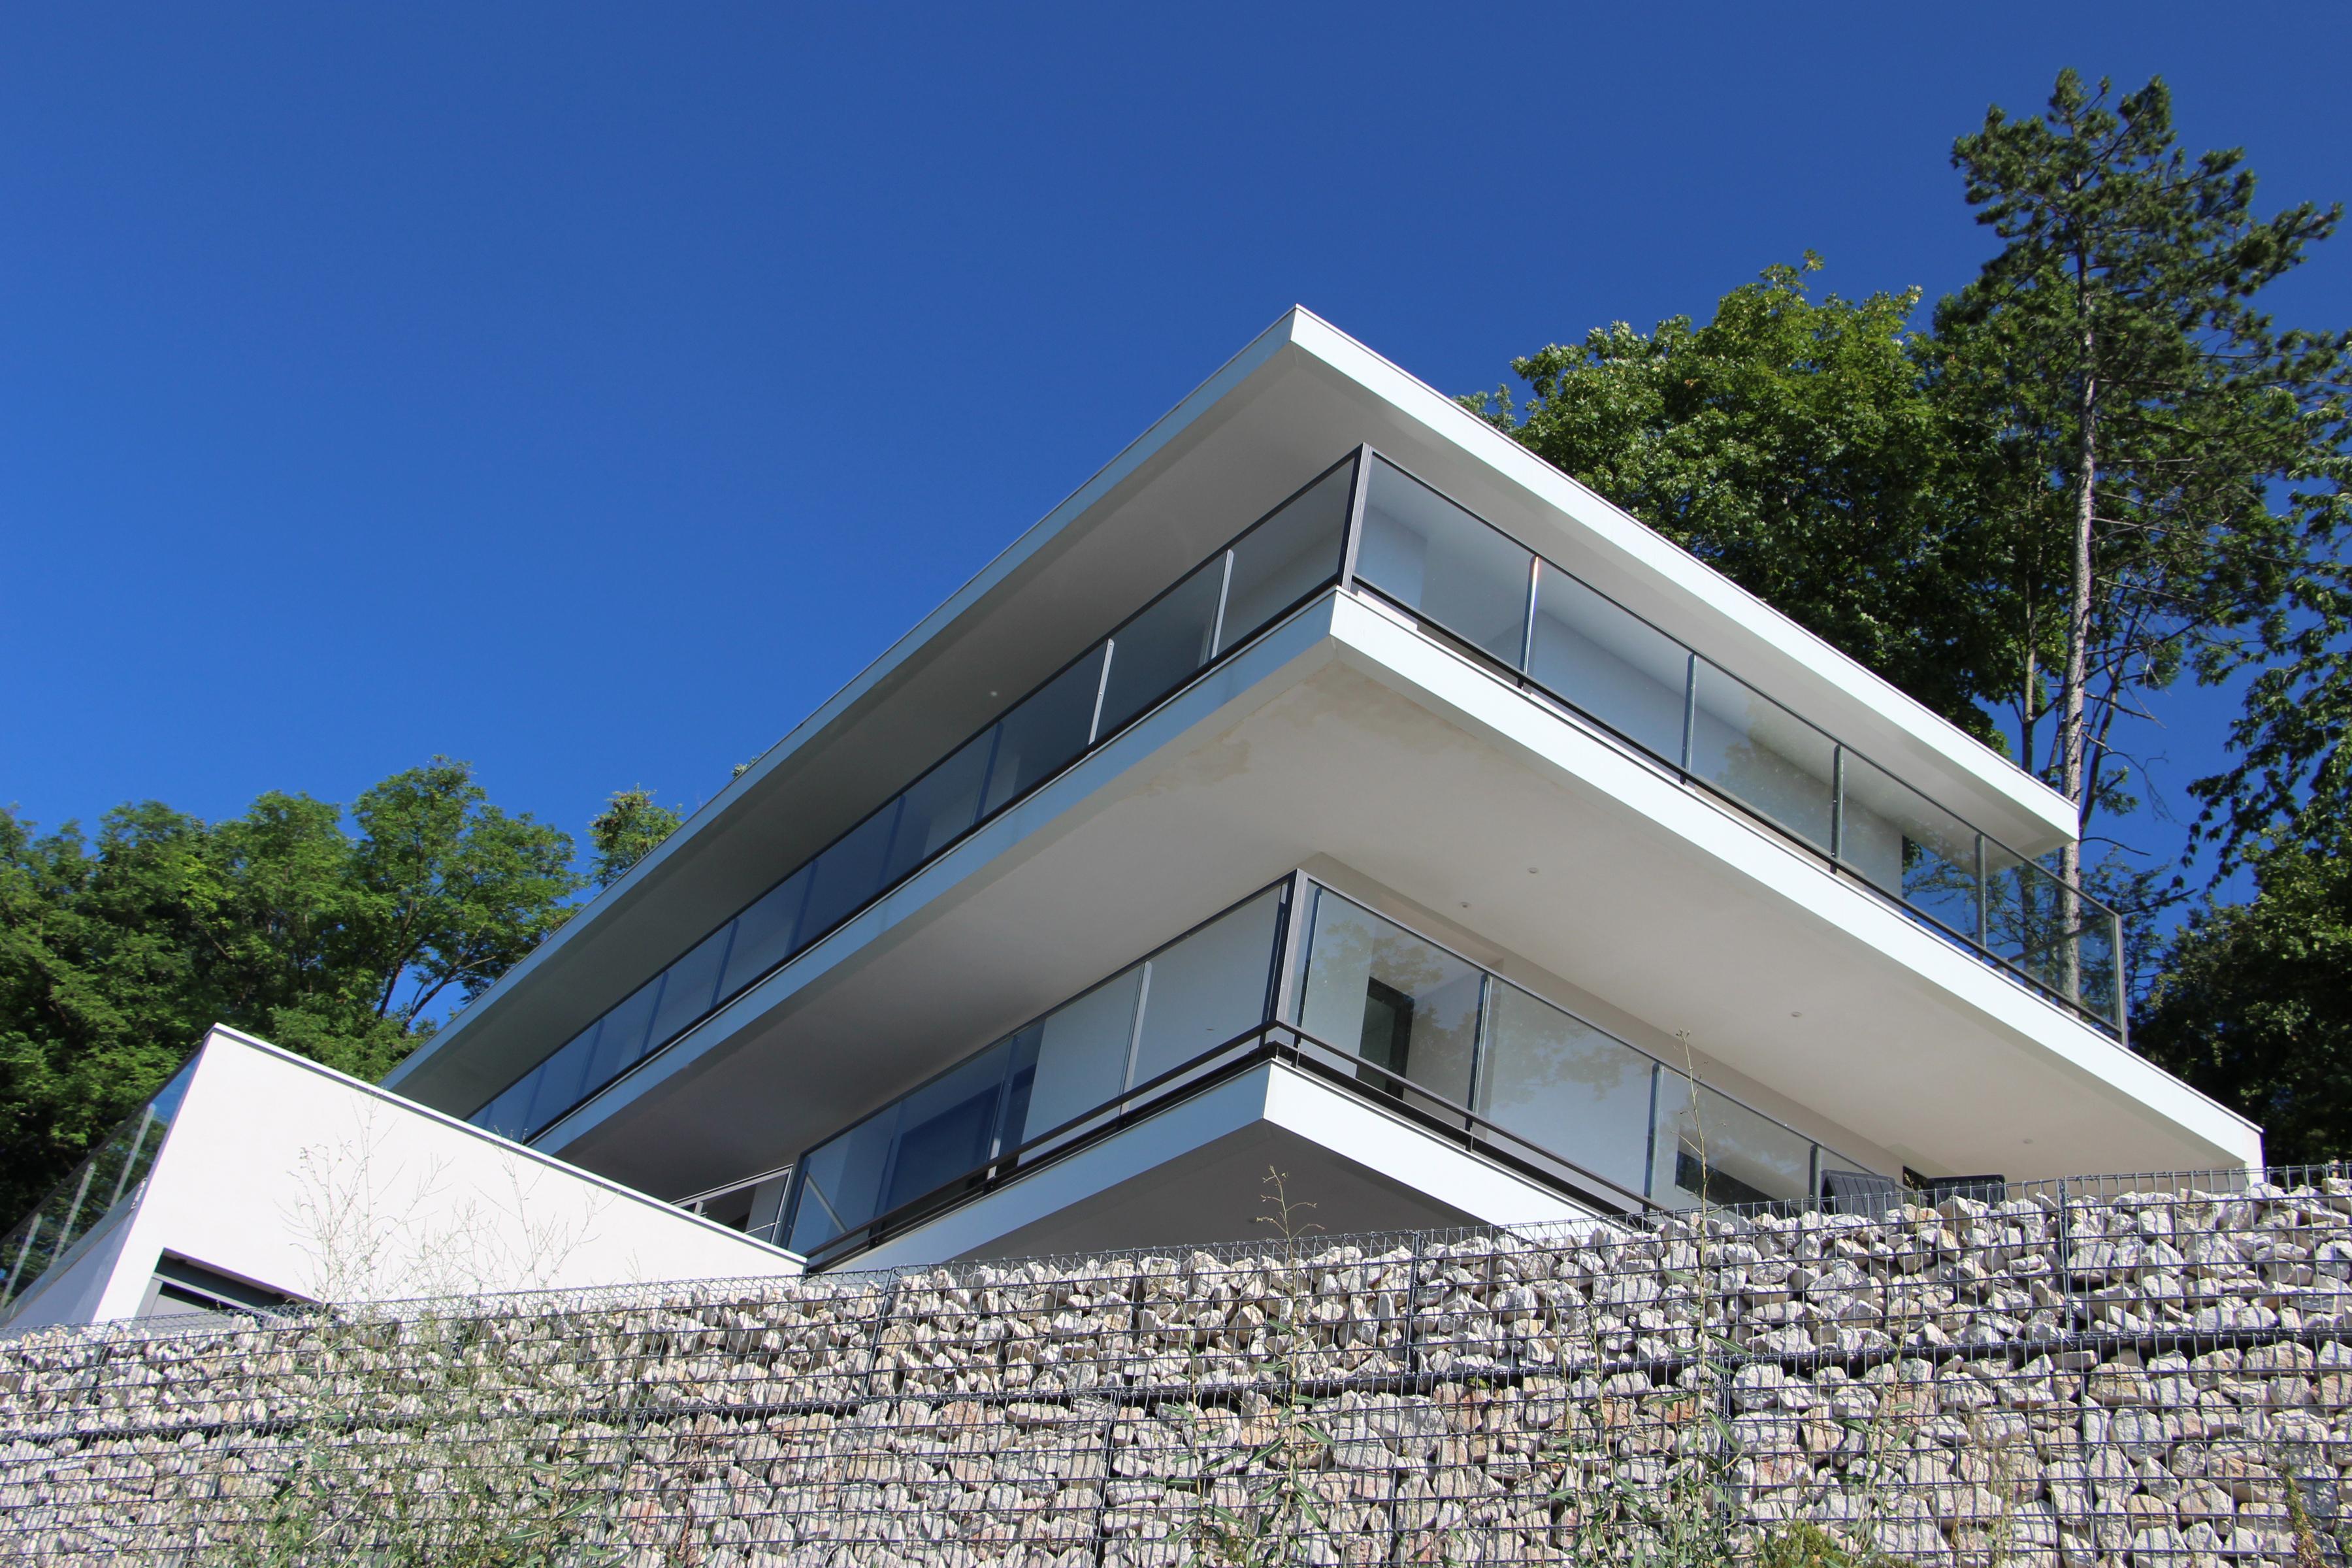 villa dc corenc 38 agora architectes grenoble agora architectes grenoble. Black Bedroom Furniture Sets. Home Design Ideas